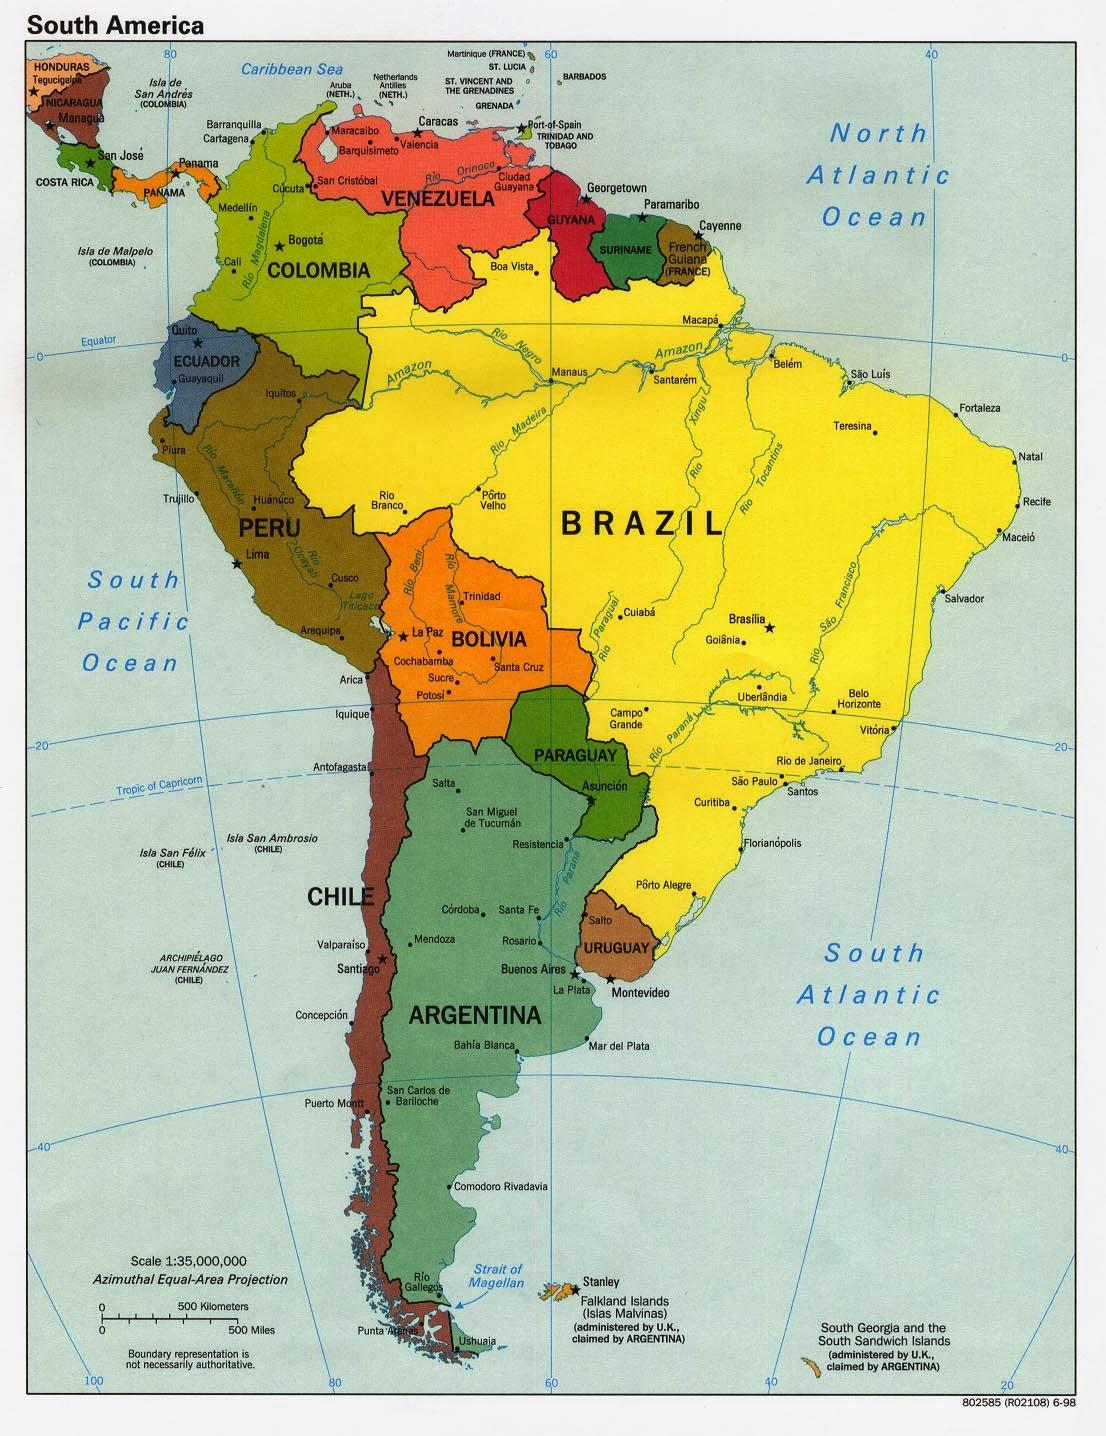 http://2.bp.blogspot.com/_nM71ngSUwfE/TB-ur9zd7iI/AAAAAAAAANY/3rY4N2OHPAg/s1600/Mapa_America.jpg